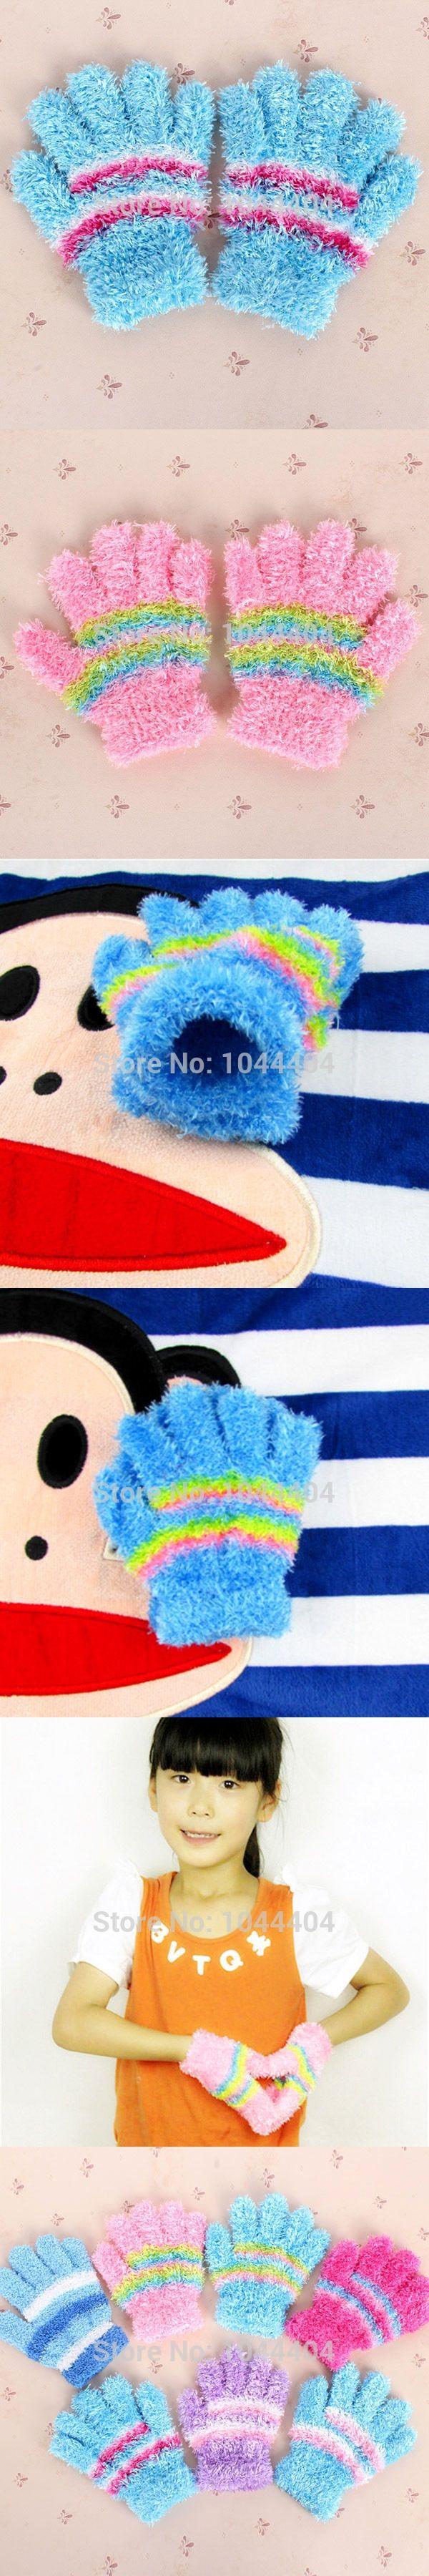 Multi-Color Unisex Kids Warm Winter Gloves Toddler Striped Mittens